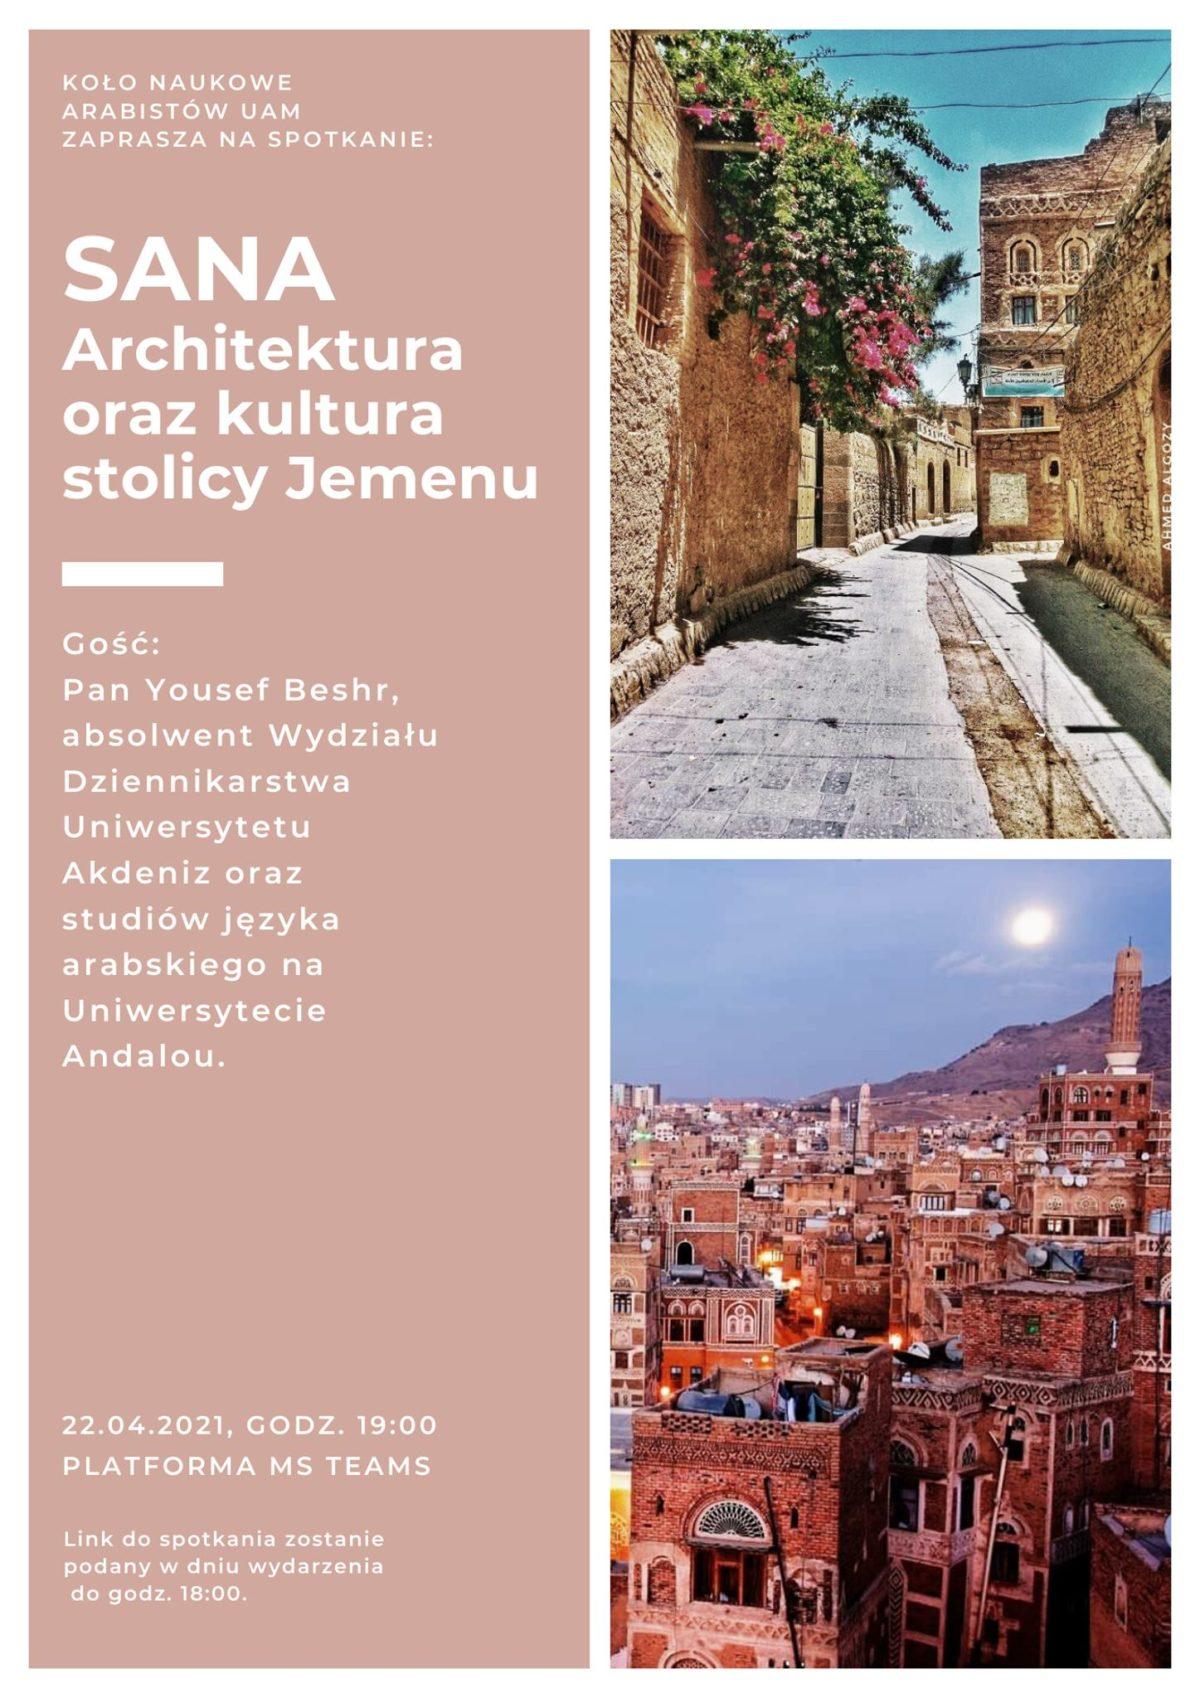 Sana – architektura oraz kultura stolicy Jemenu